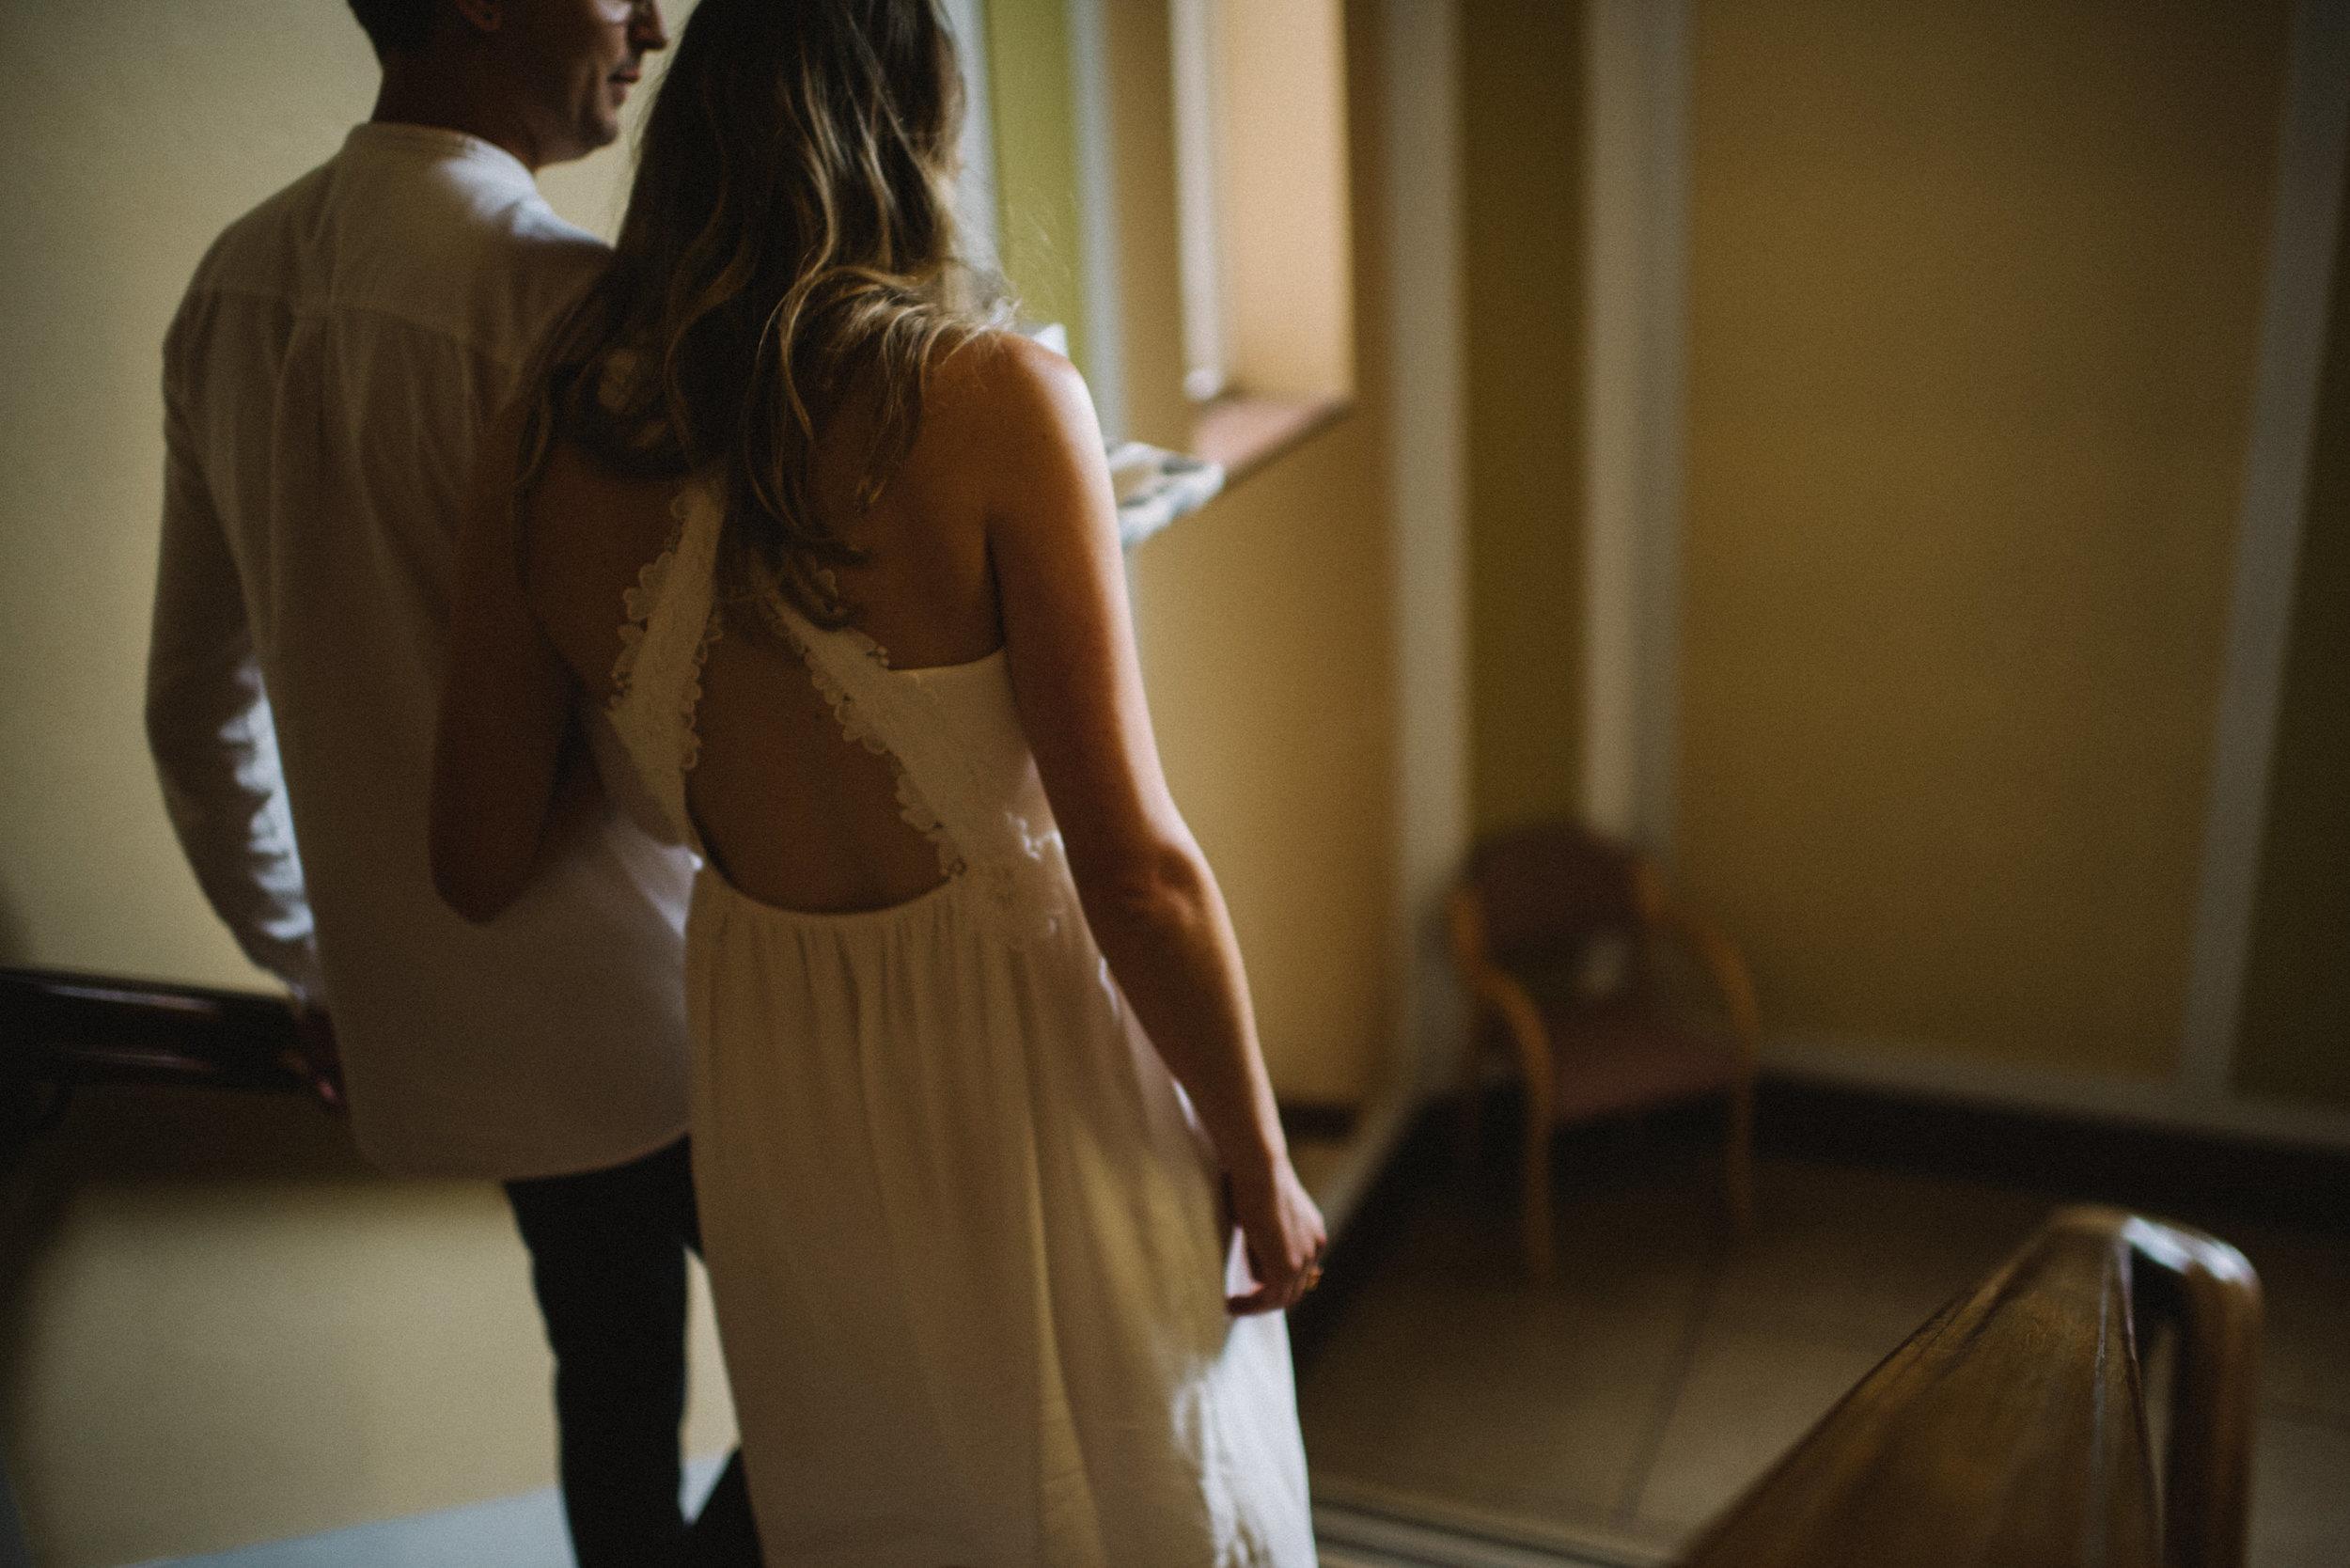 0036-LISA-DEVINE-PHOTOGRAPHY-ALTERNATIVE-WEDDING-PHOTOGRAPHY-SCOTLAND-DESTINATION-WEDDINGS-GLASGOW-WEDDINGS-COOL-WEDDINGS-STYLISH-WEDDINGS.JPG